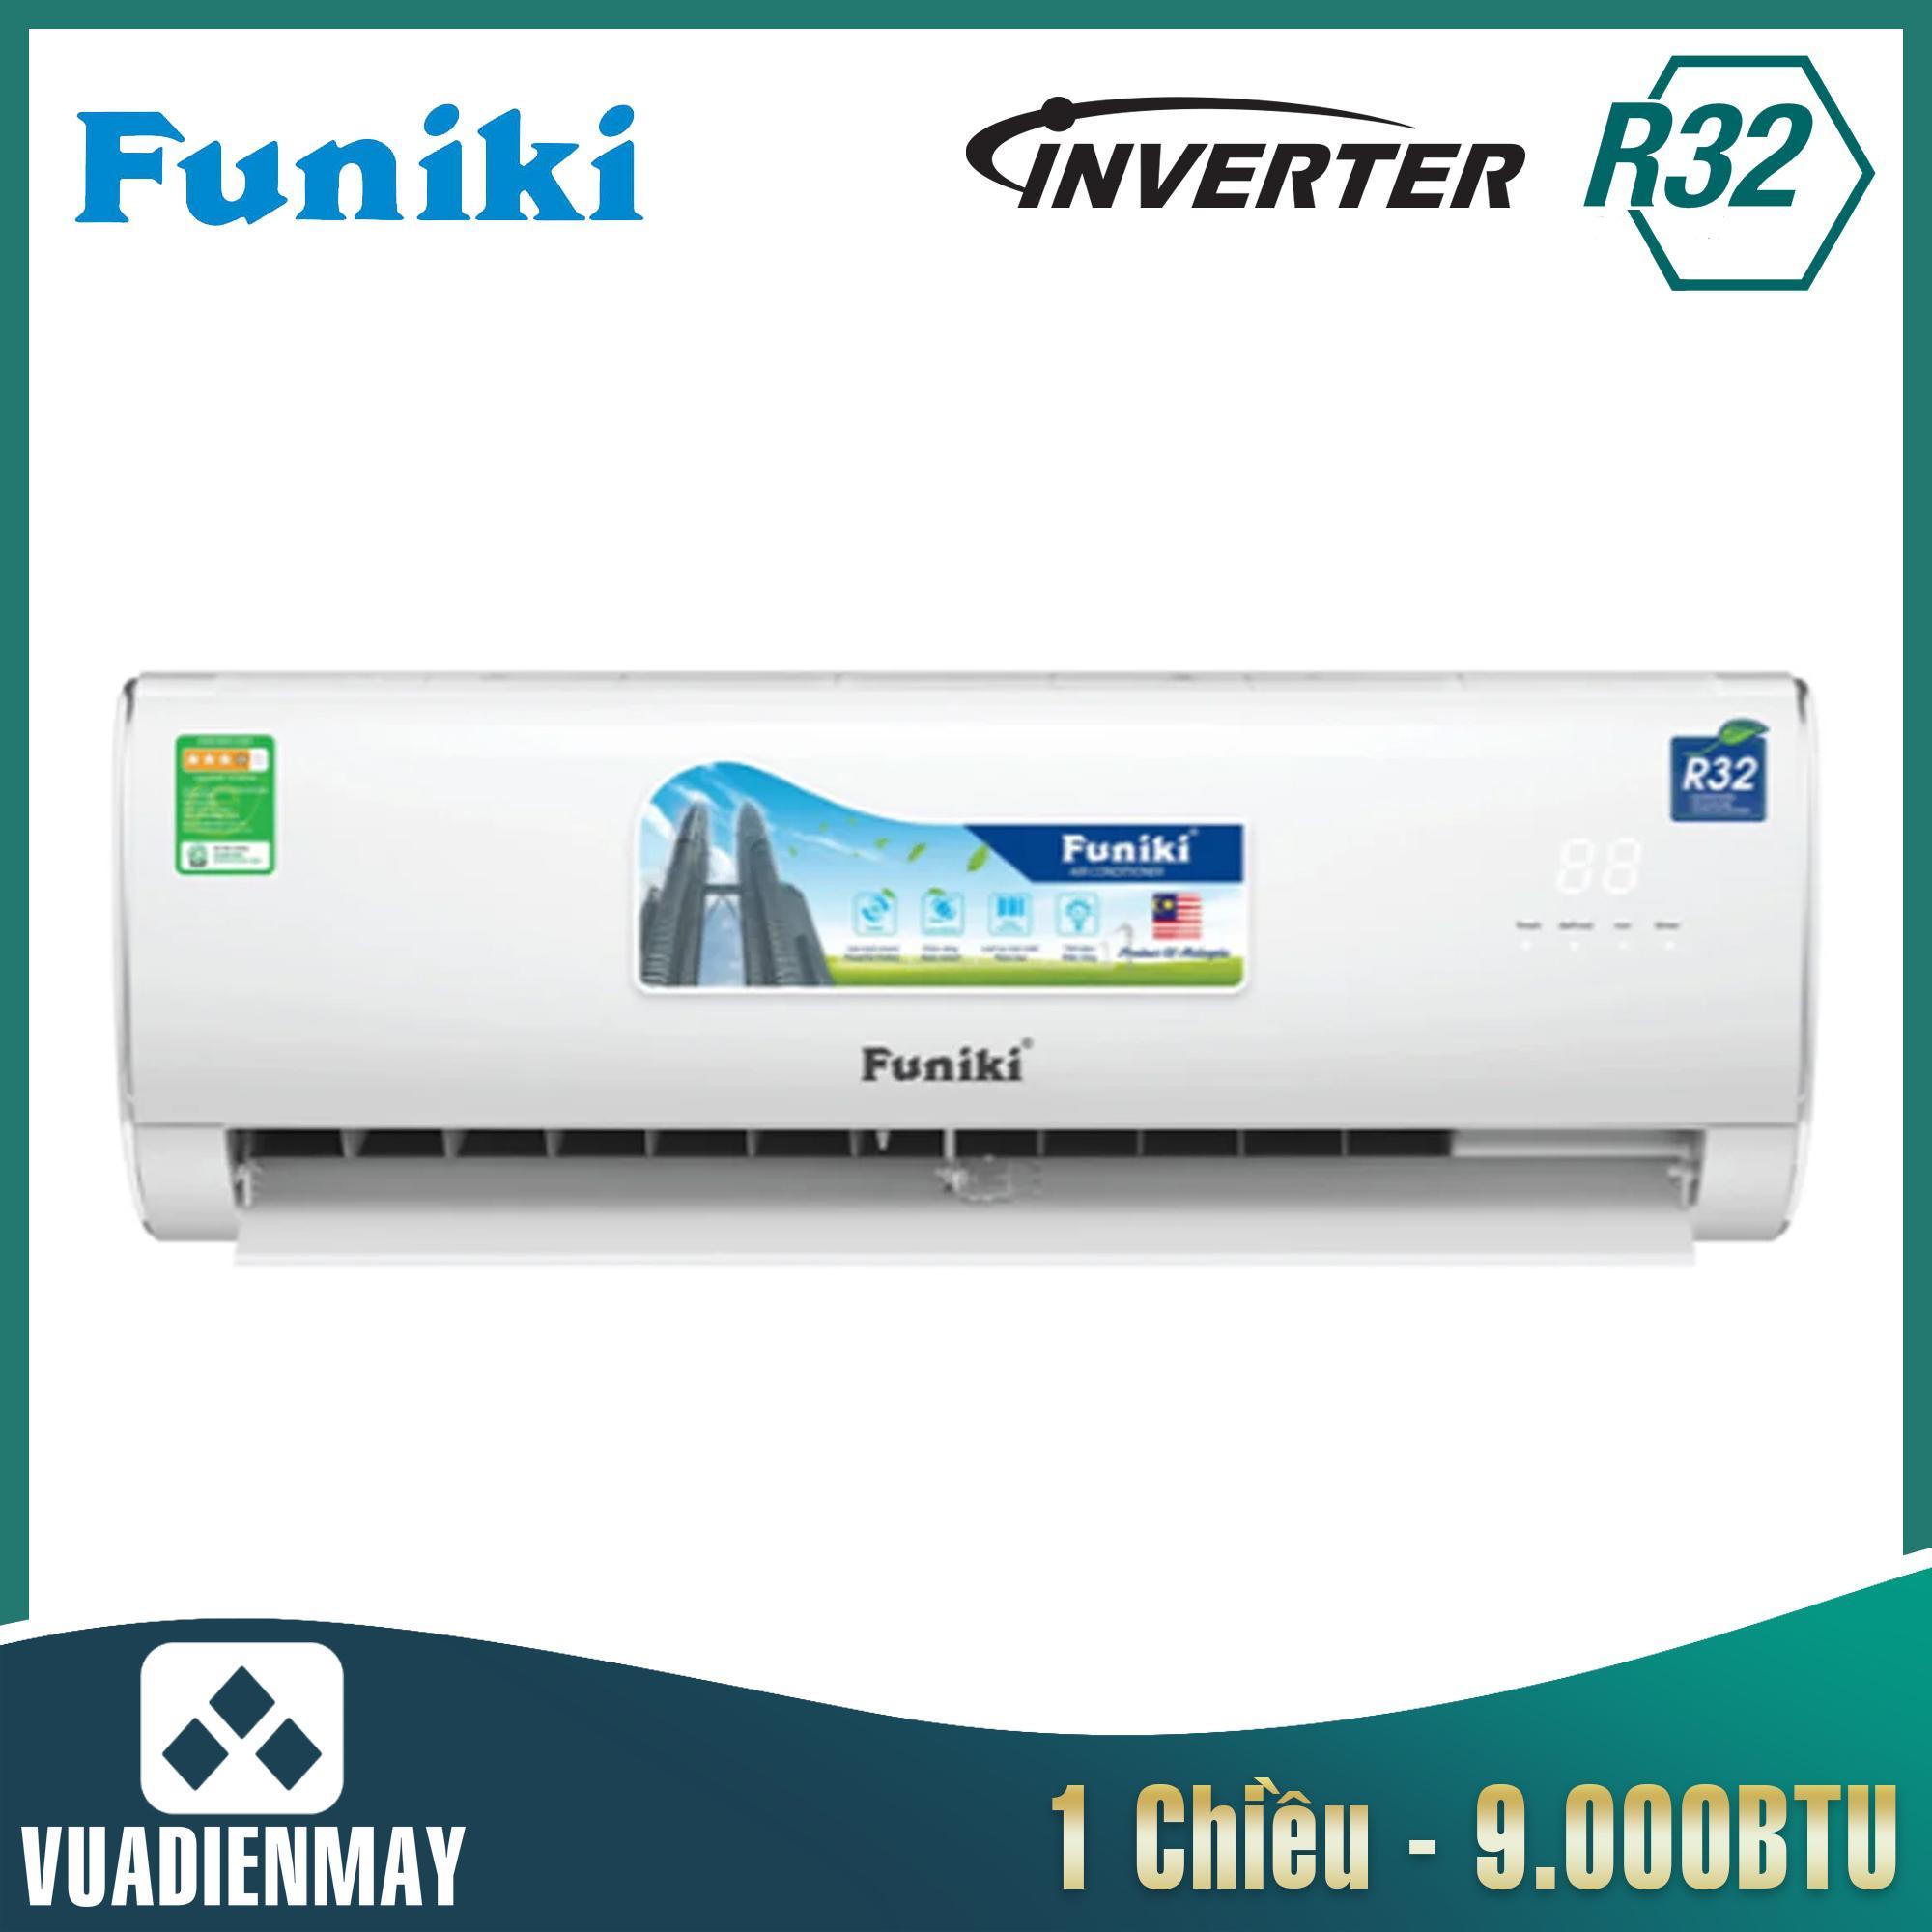 HIC09MMC, Điều hòa Funiki 9000BTU 1 chiều Inverter